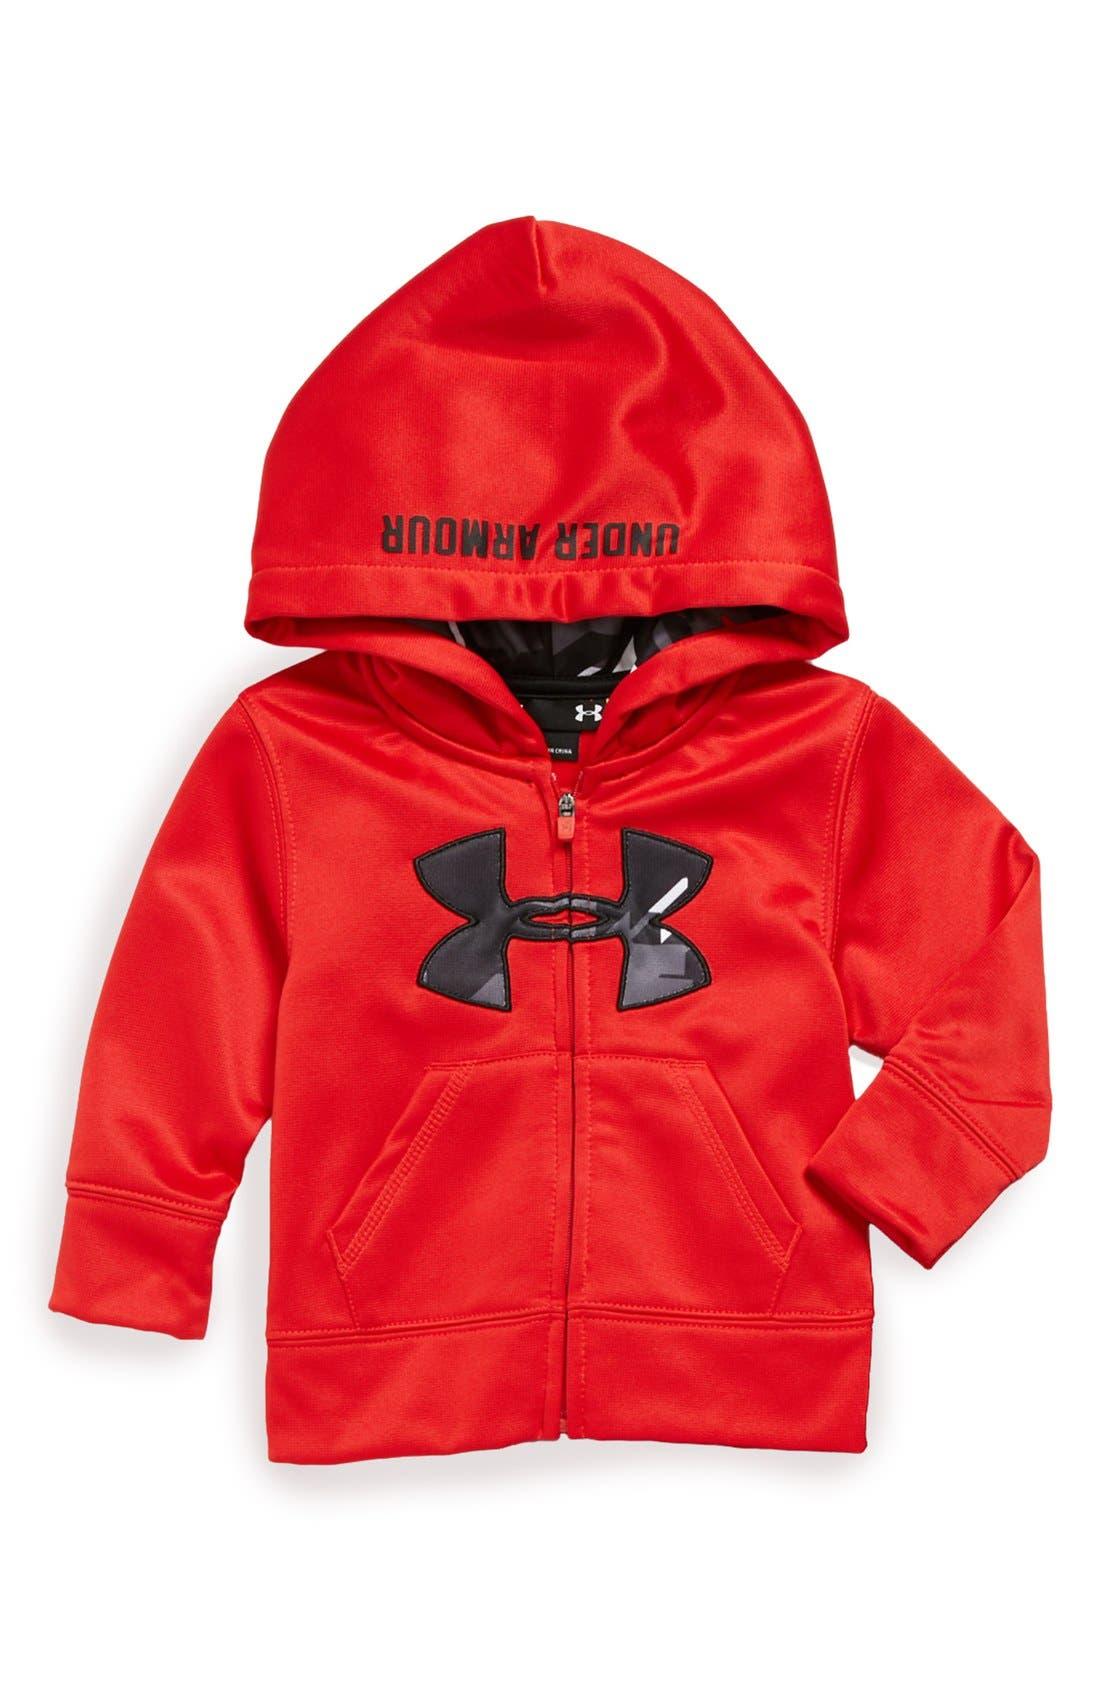 Main Image - Under Armour 'Edge' Camo Logo Hoodie (Toddler Boys)